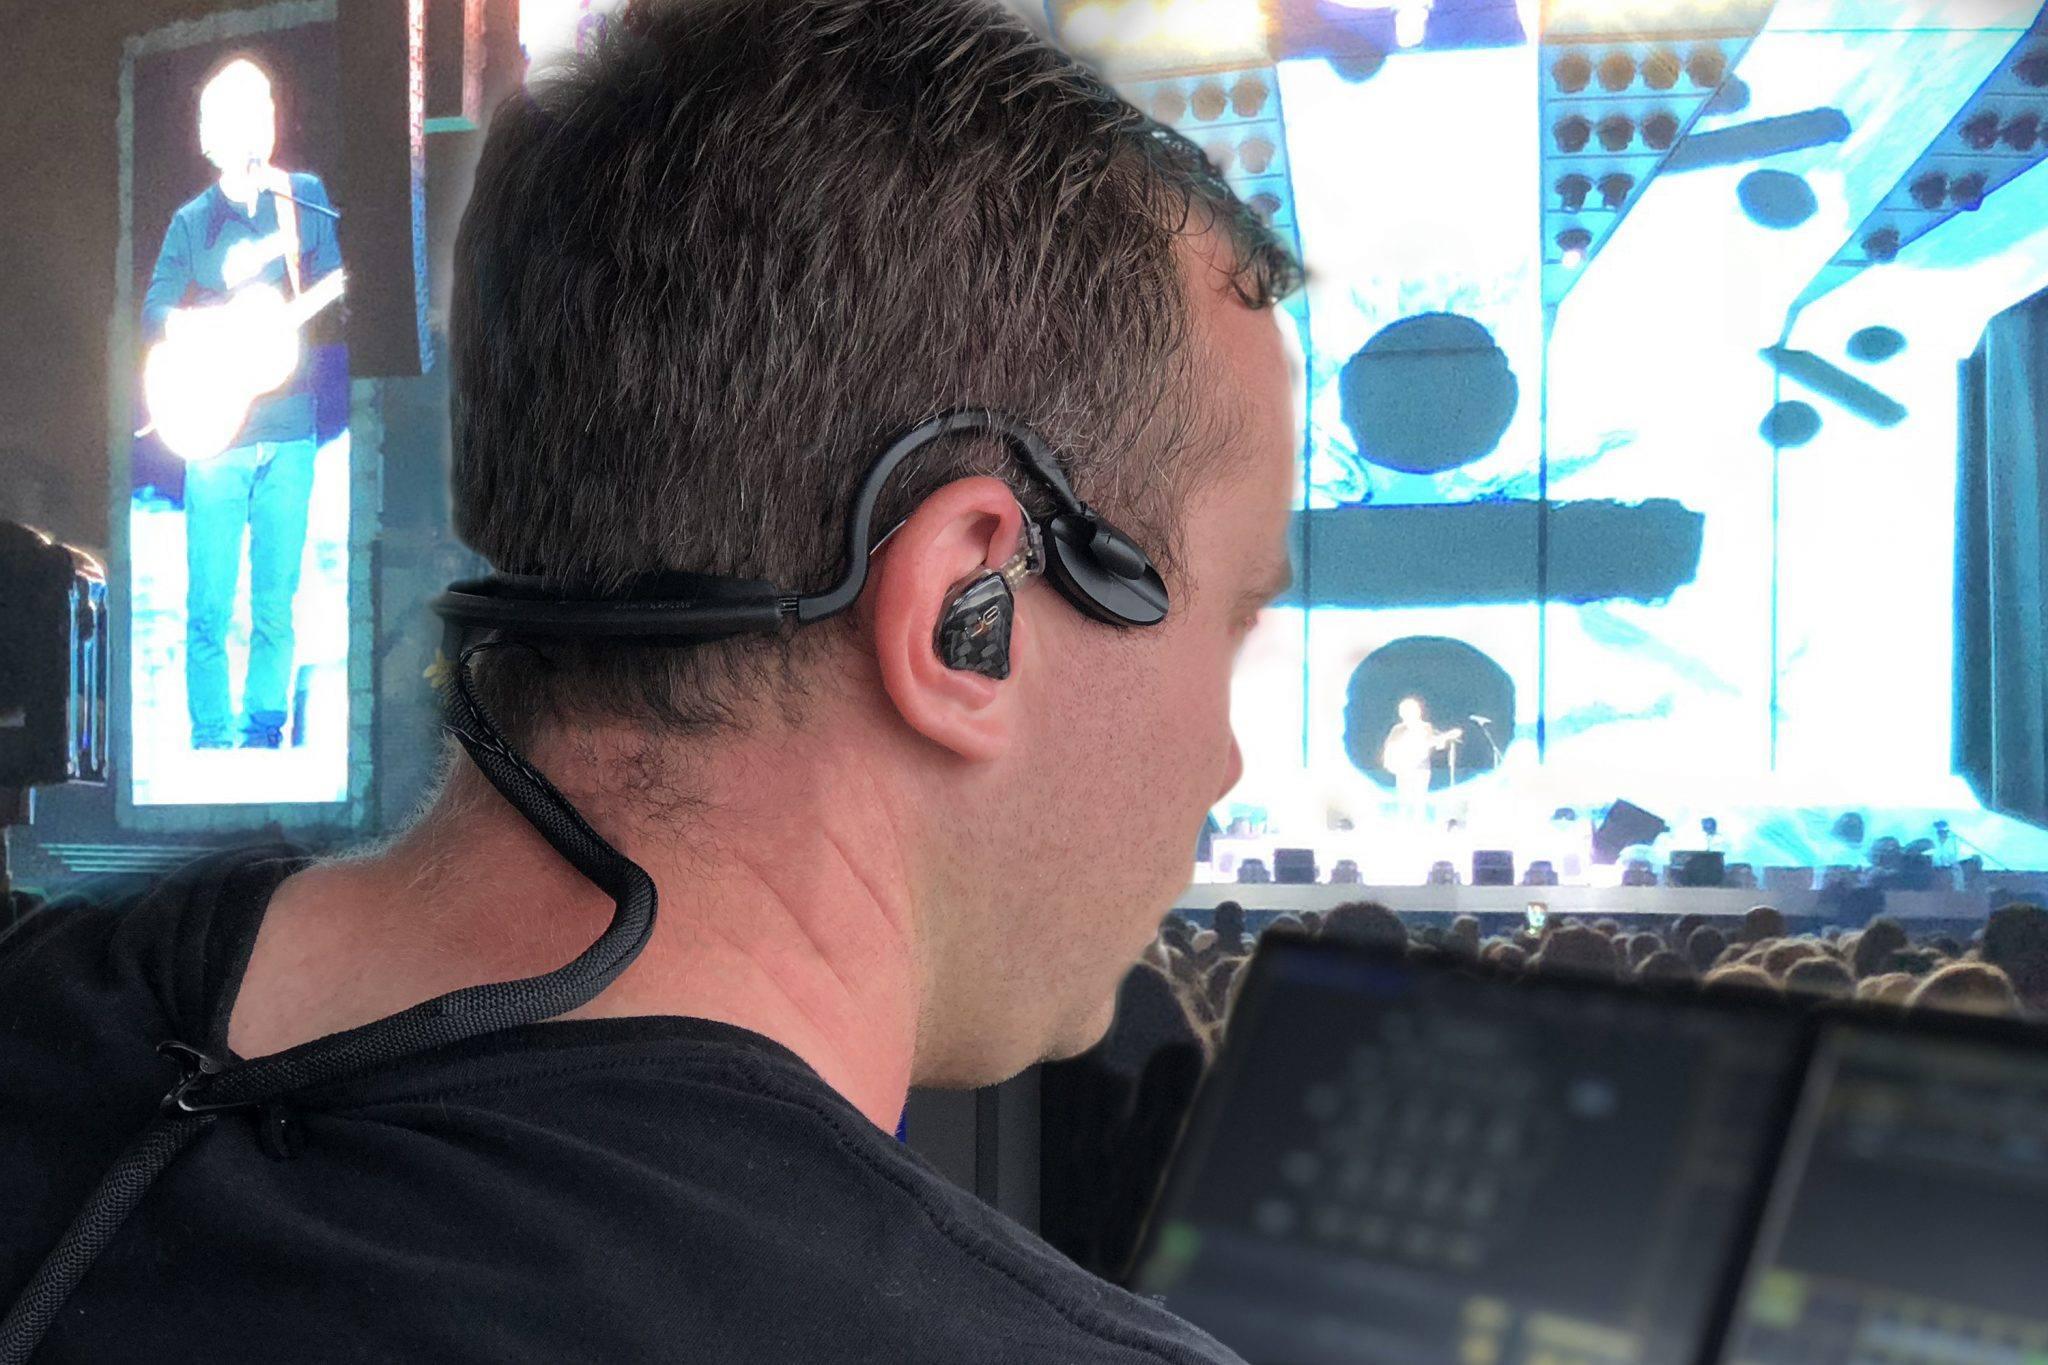 CM-i3 in ear headset with ultimate in-ears